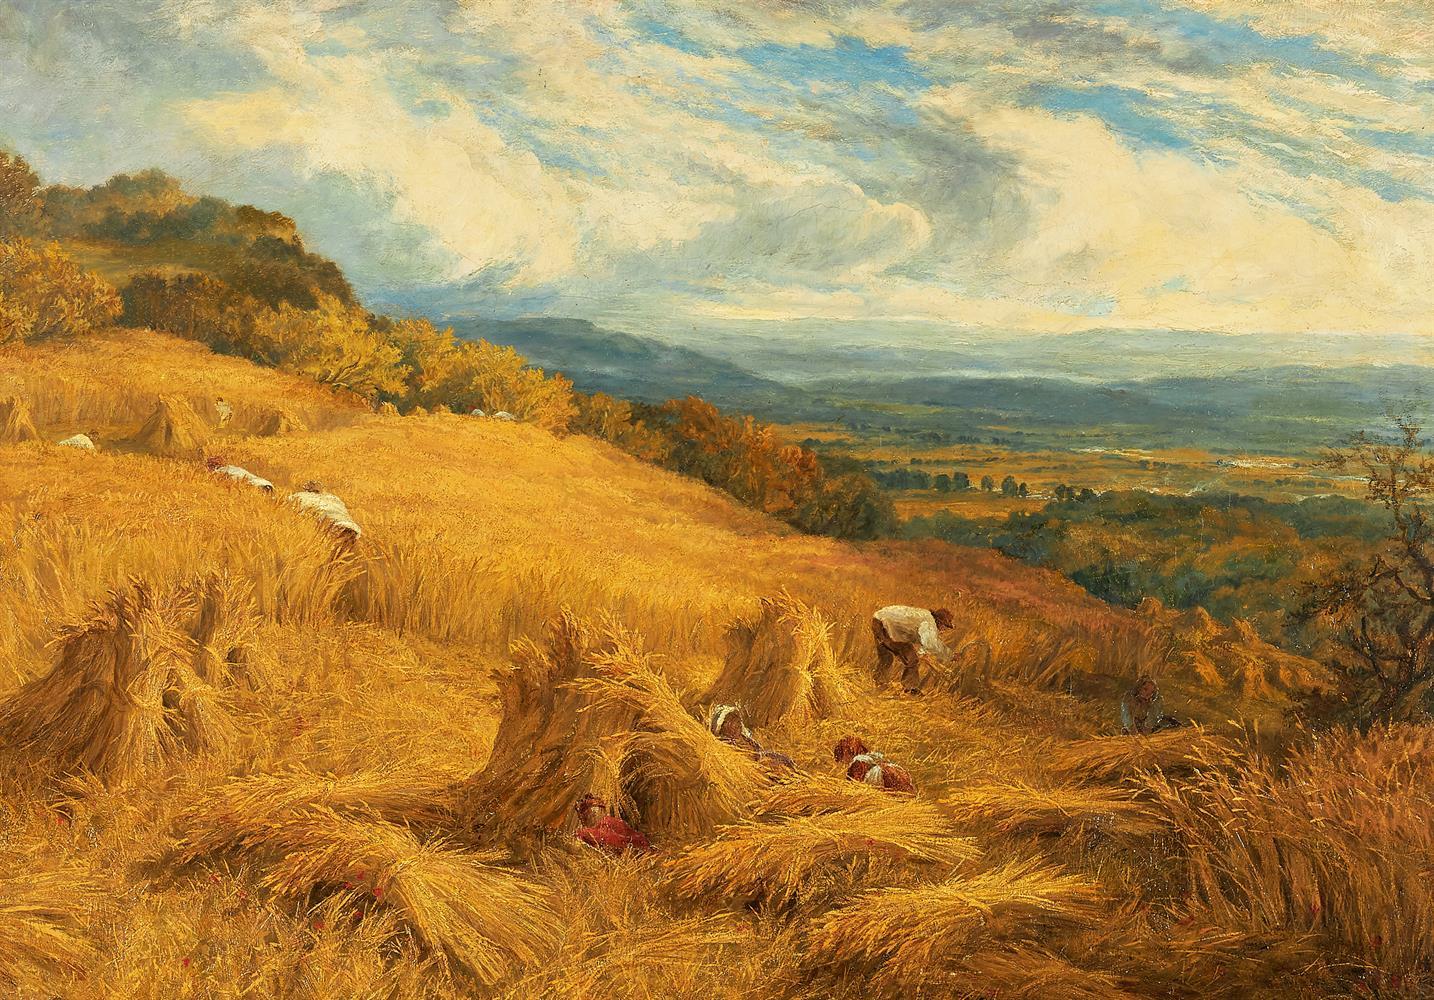 CIRCLE OF JOHN CLAYTON ADAMS (BRITISH 1840-1906), HARVESTING THE CORN - Image 2 of 2